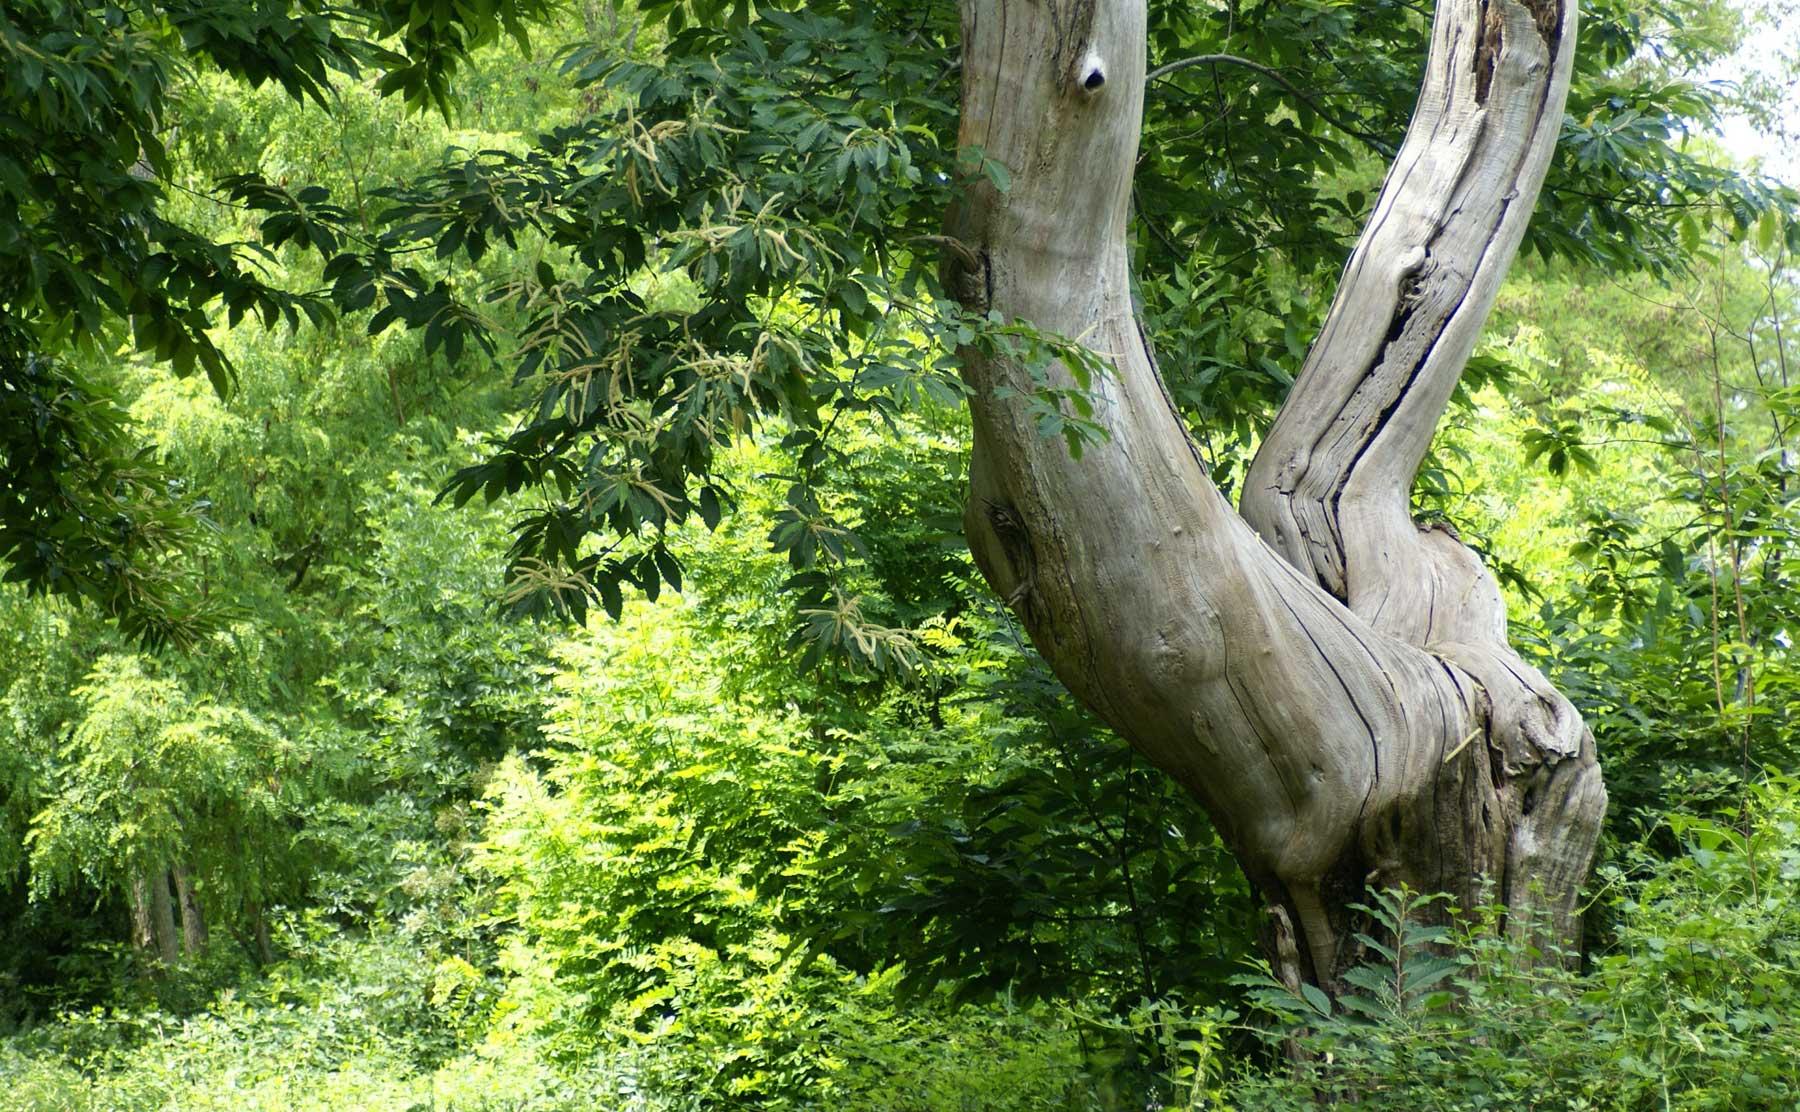 photo de fond : Un arbre